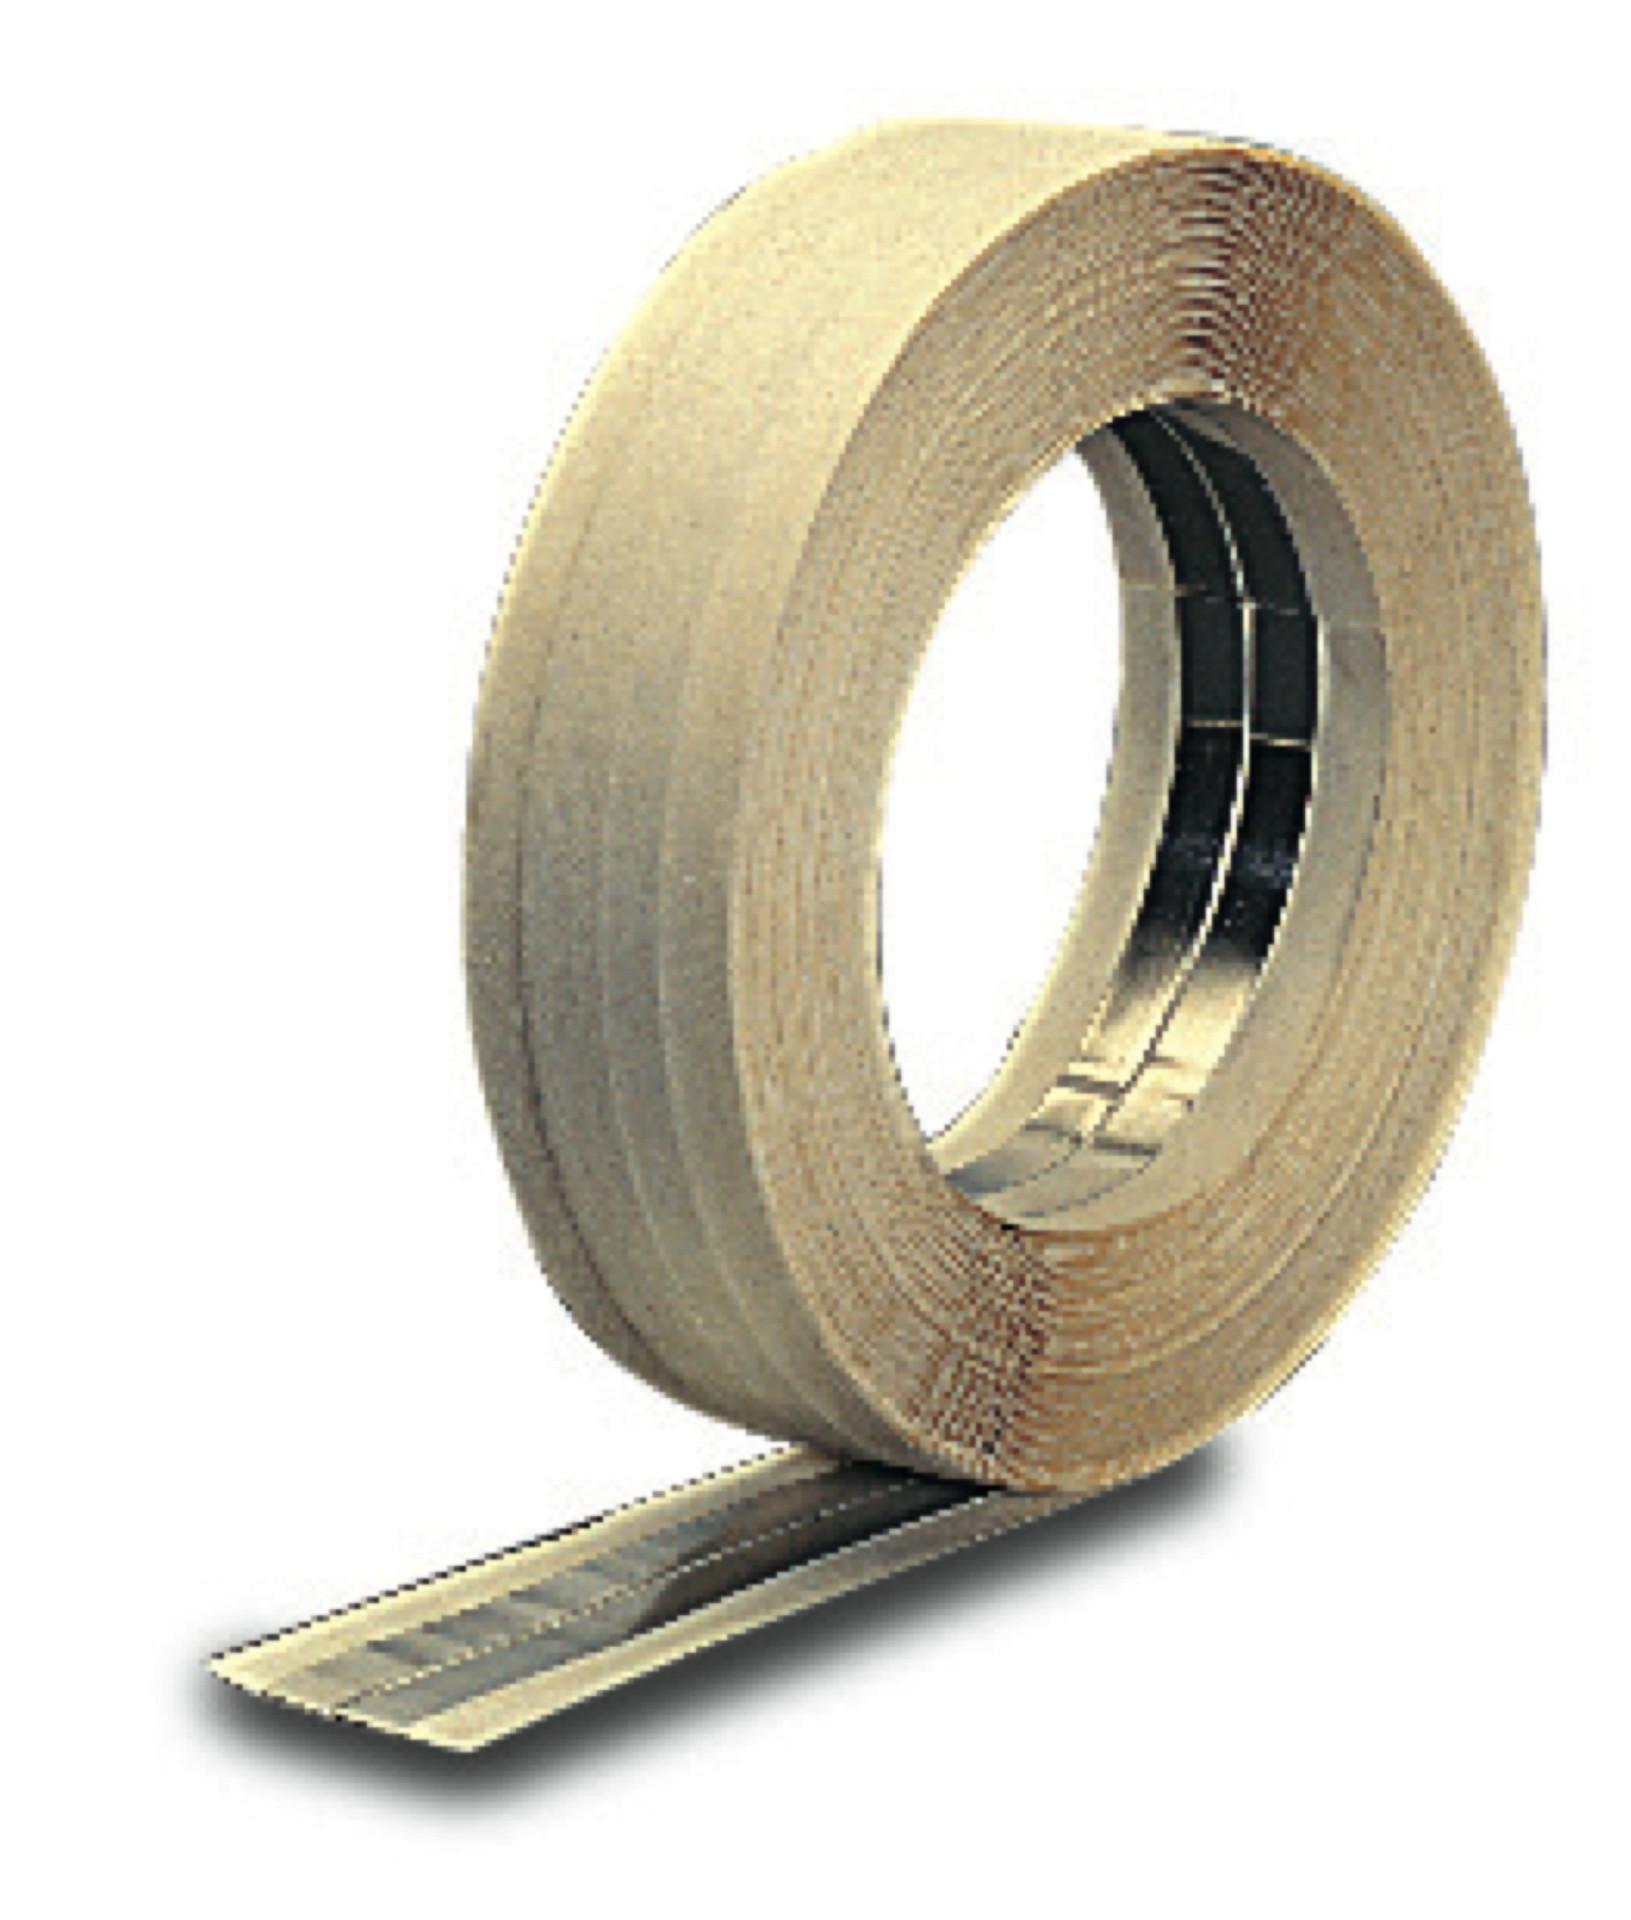 knauf alux-kantenschutz 30000x50 mm, kantenschutzstreifen aus